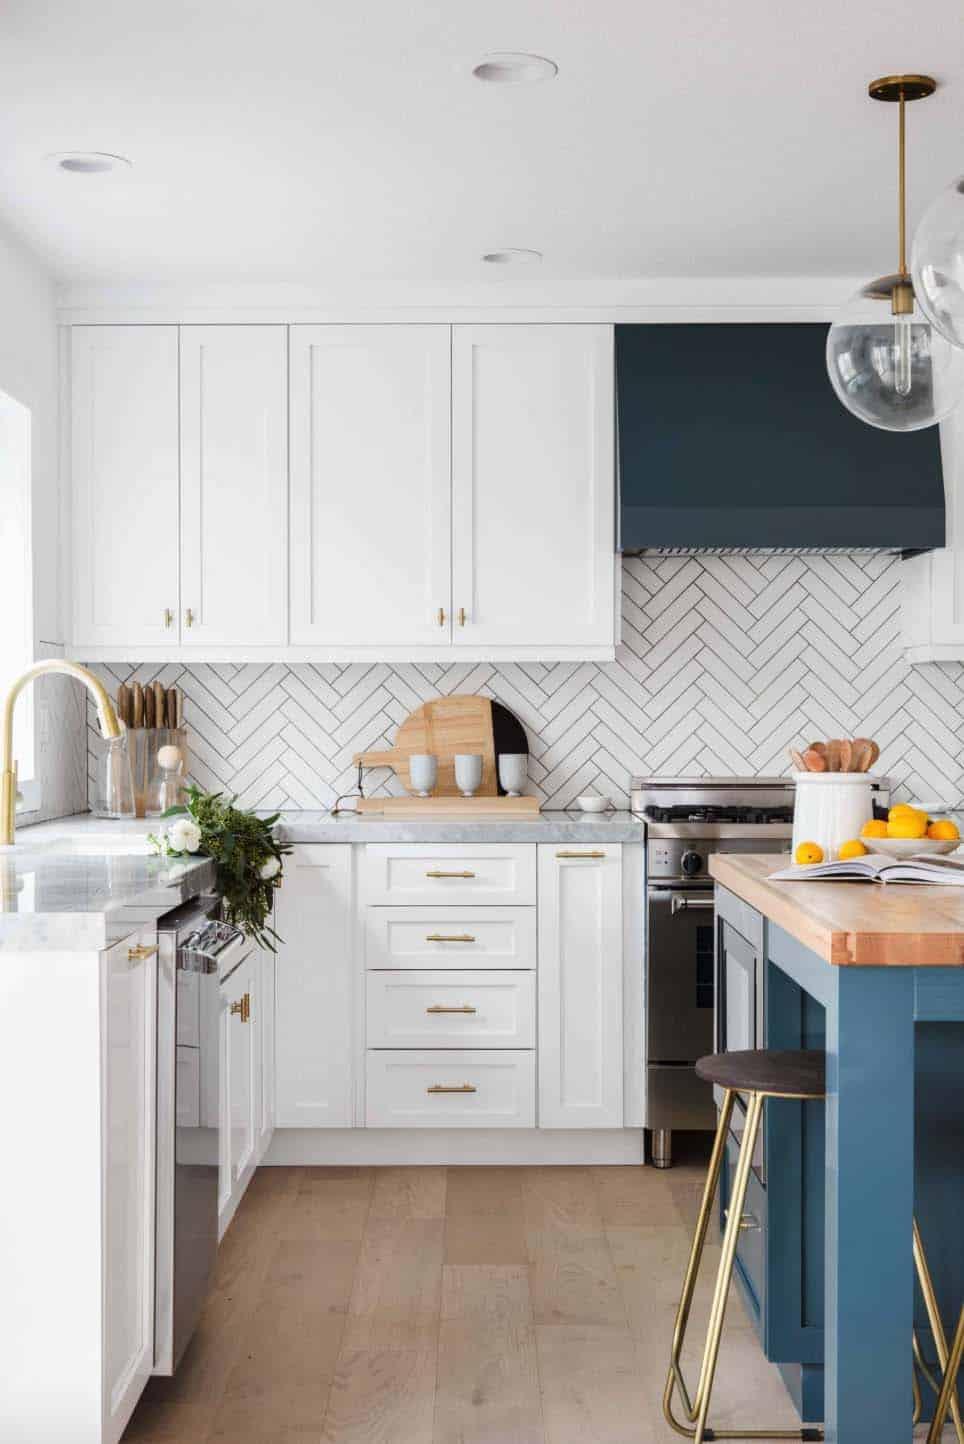 California Eclectic Home-Lindye Galloway Interiors-12-1 Kindesign